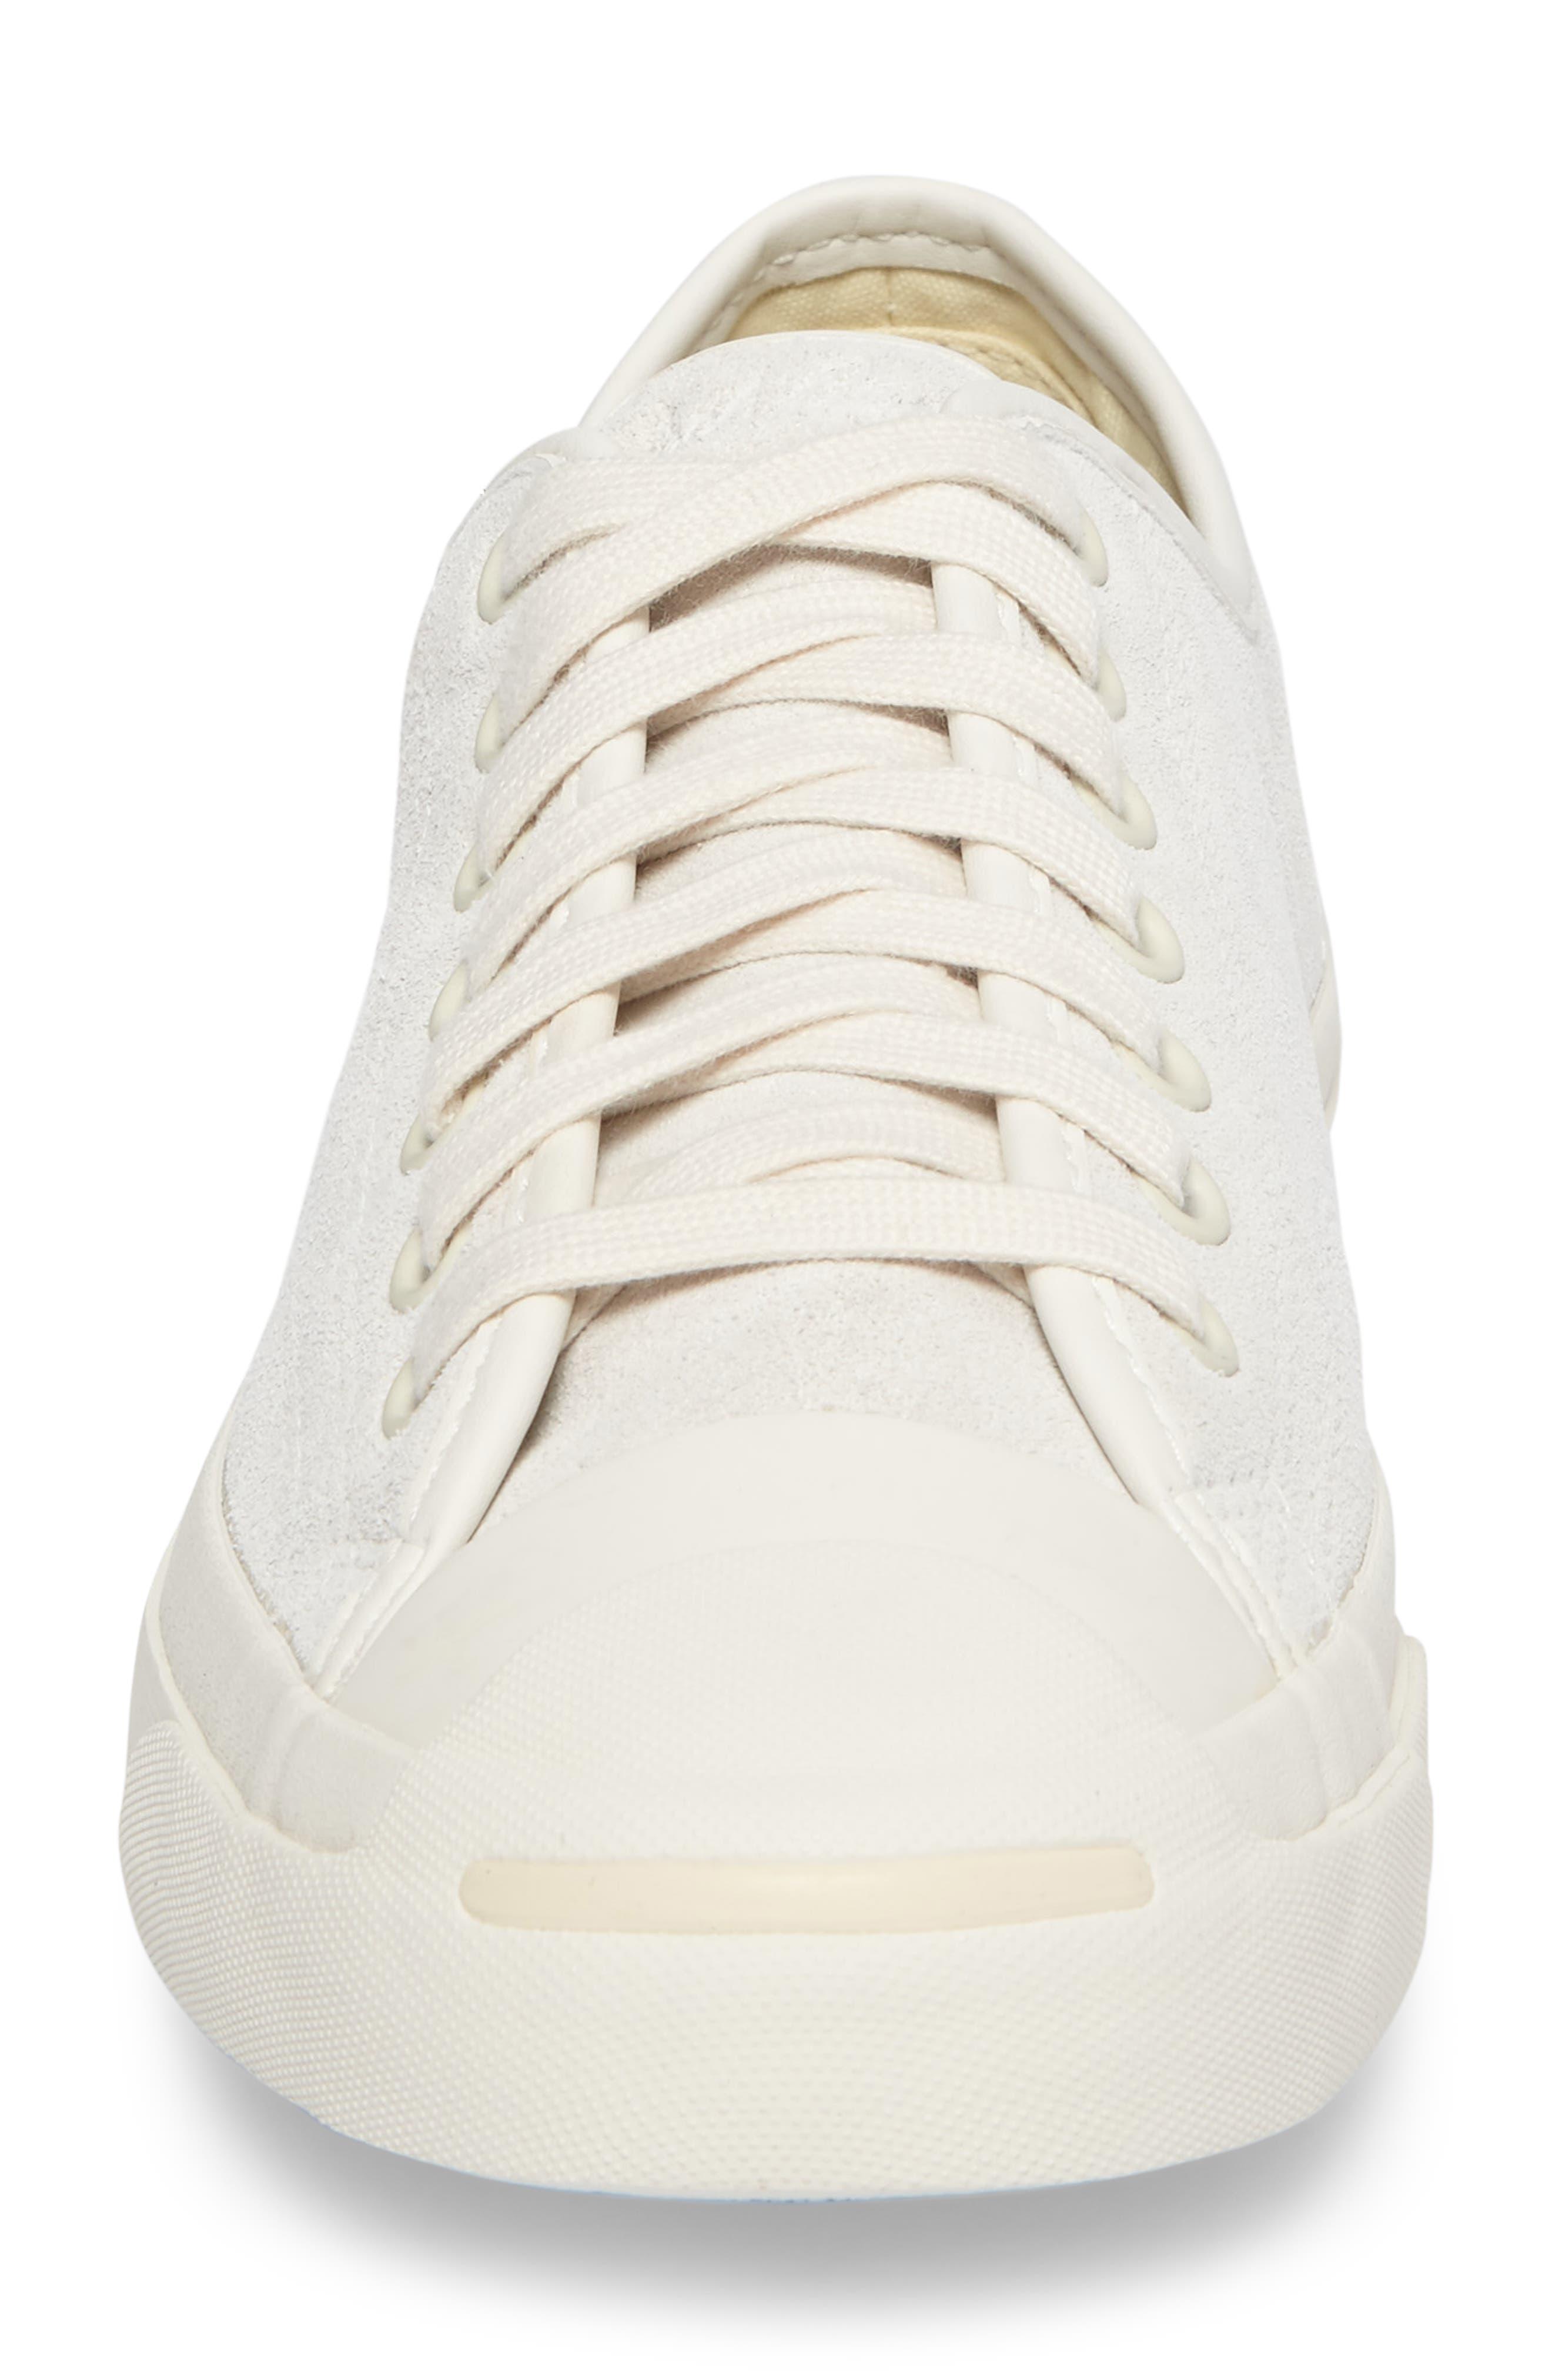 Jack Purcell Sneaker,                             Alternate thumbnail 4, color,                             020